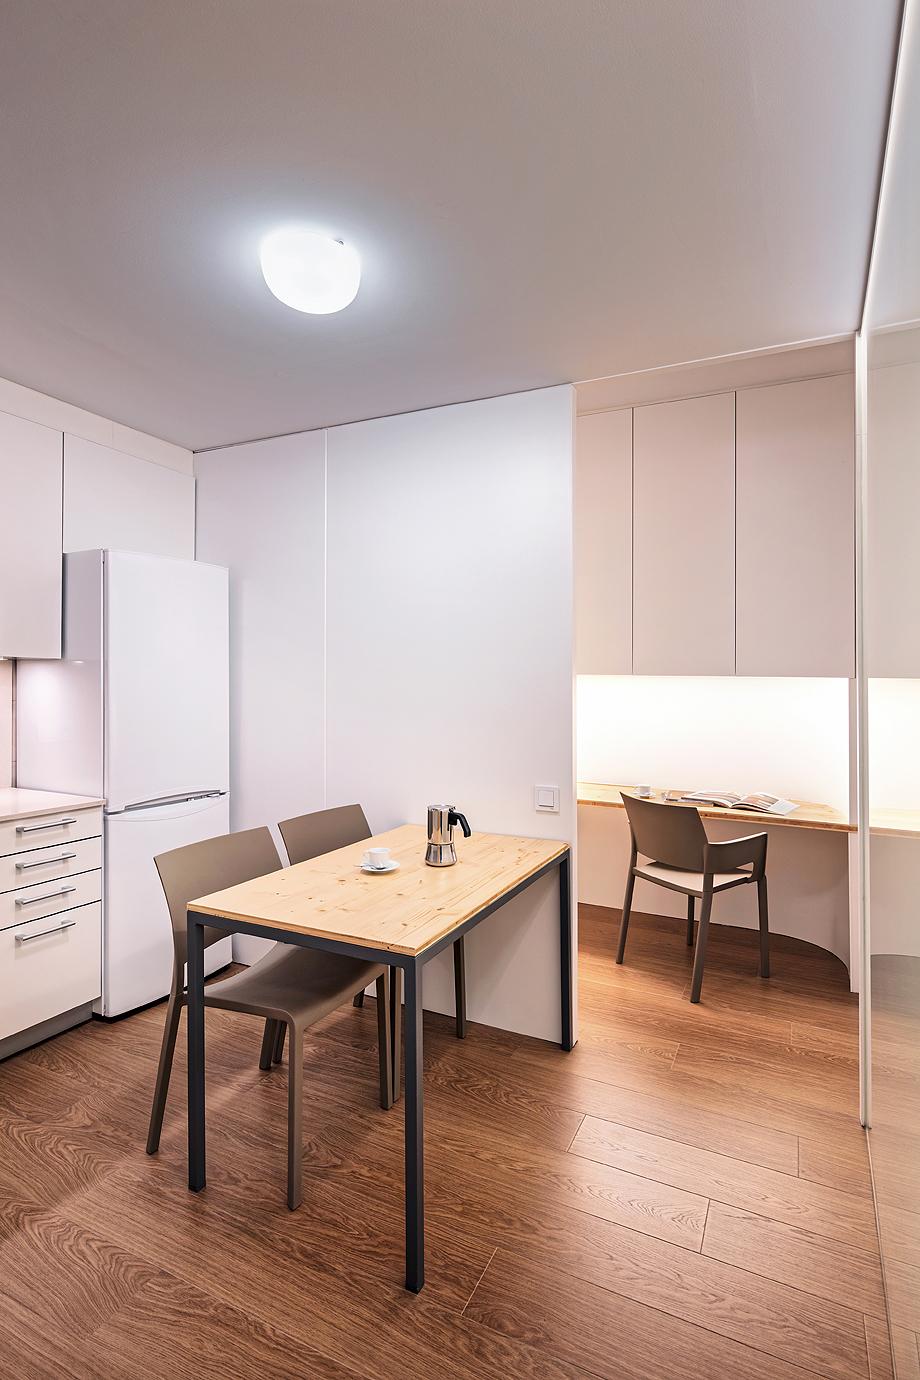 vivienda de alquiler diseño low cost agusti costa (6)